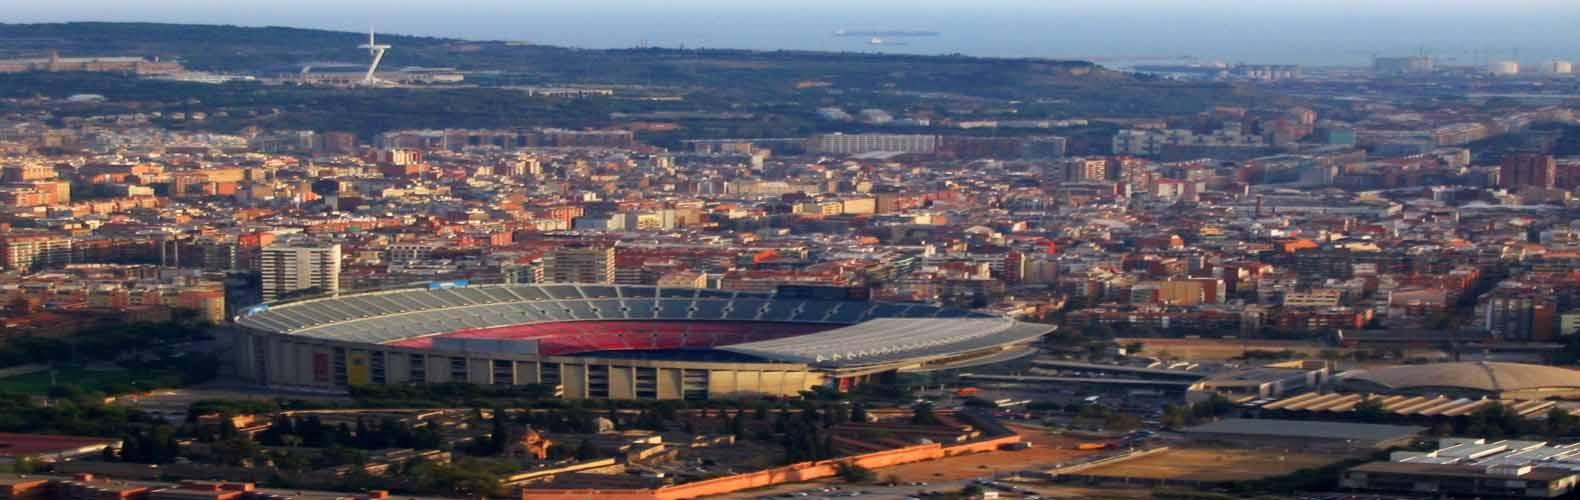 Piso en venta ne les Corts de Barcelona